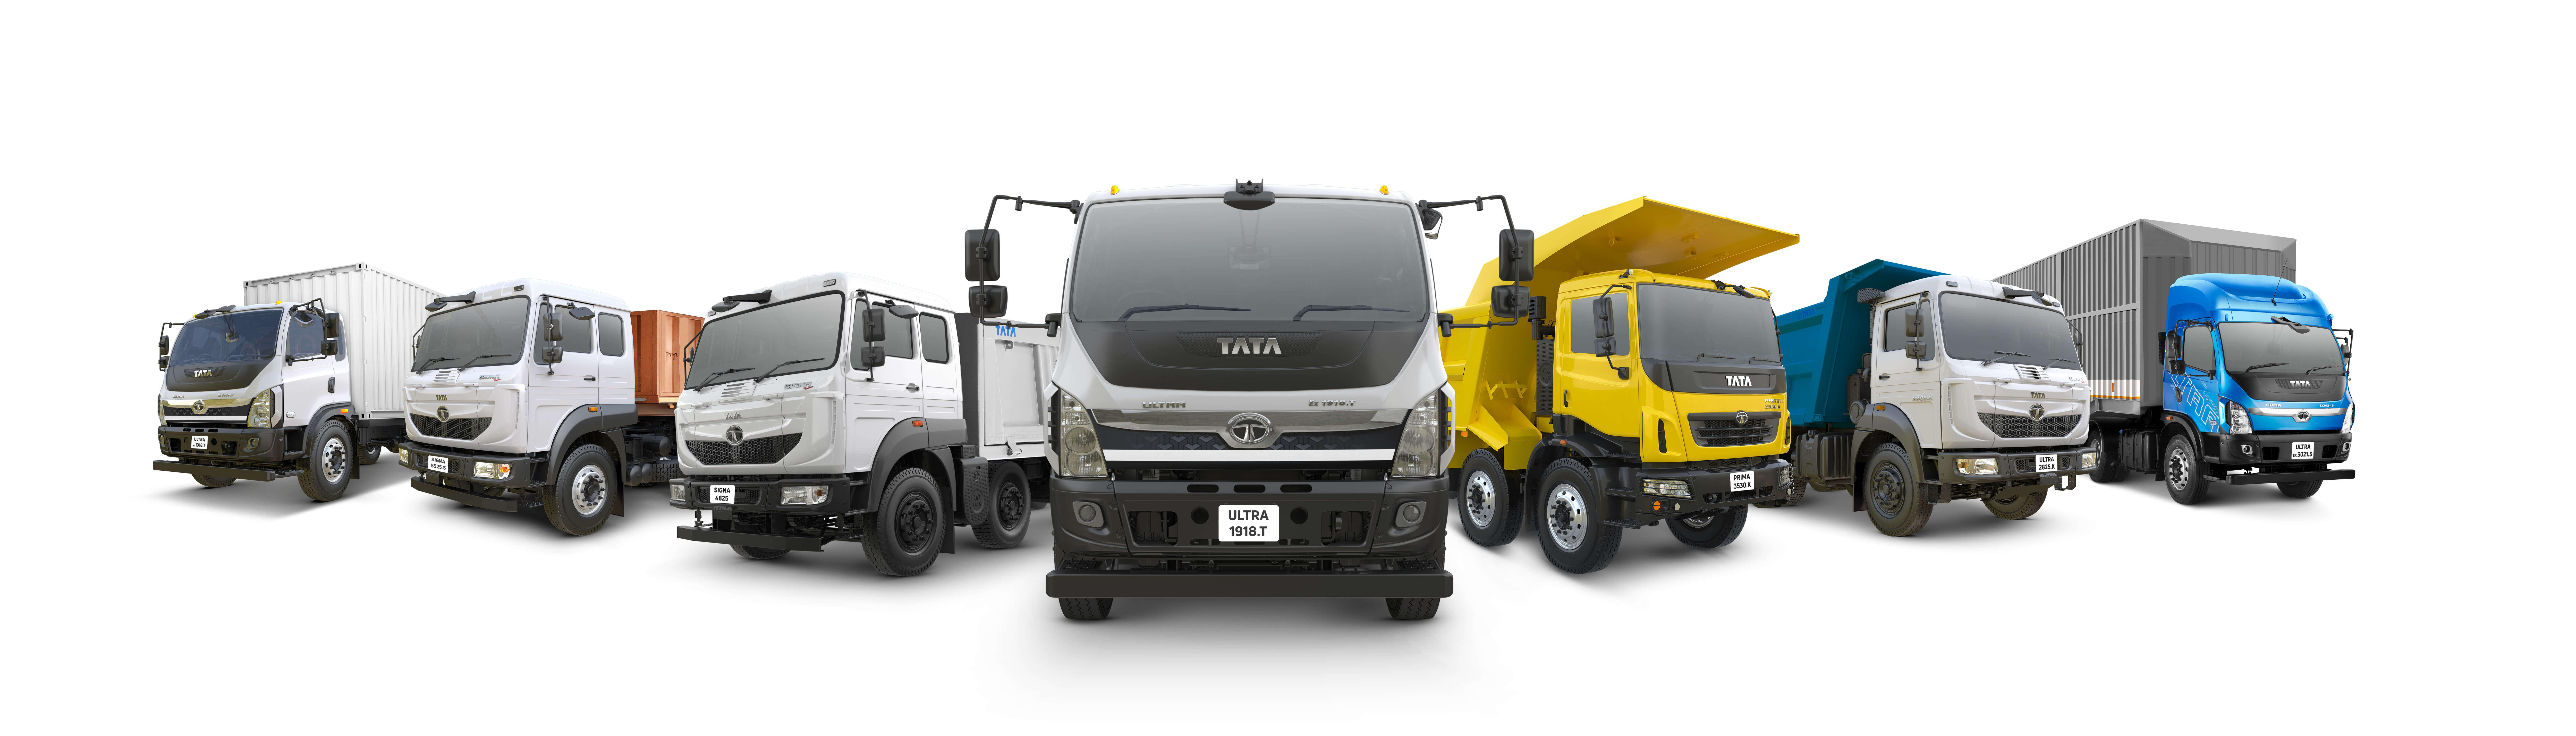 Tata Motors' medium and heavy cargo trucks help move the nation, assure best operating economics for fleet